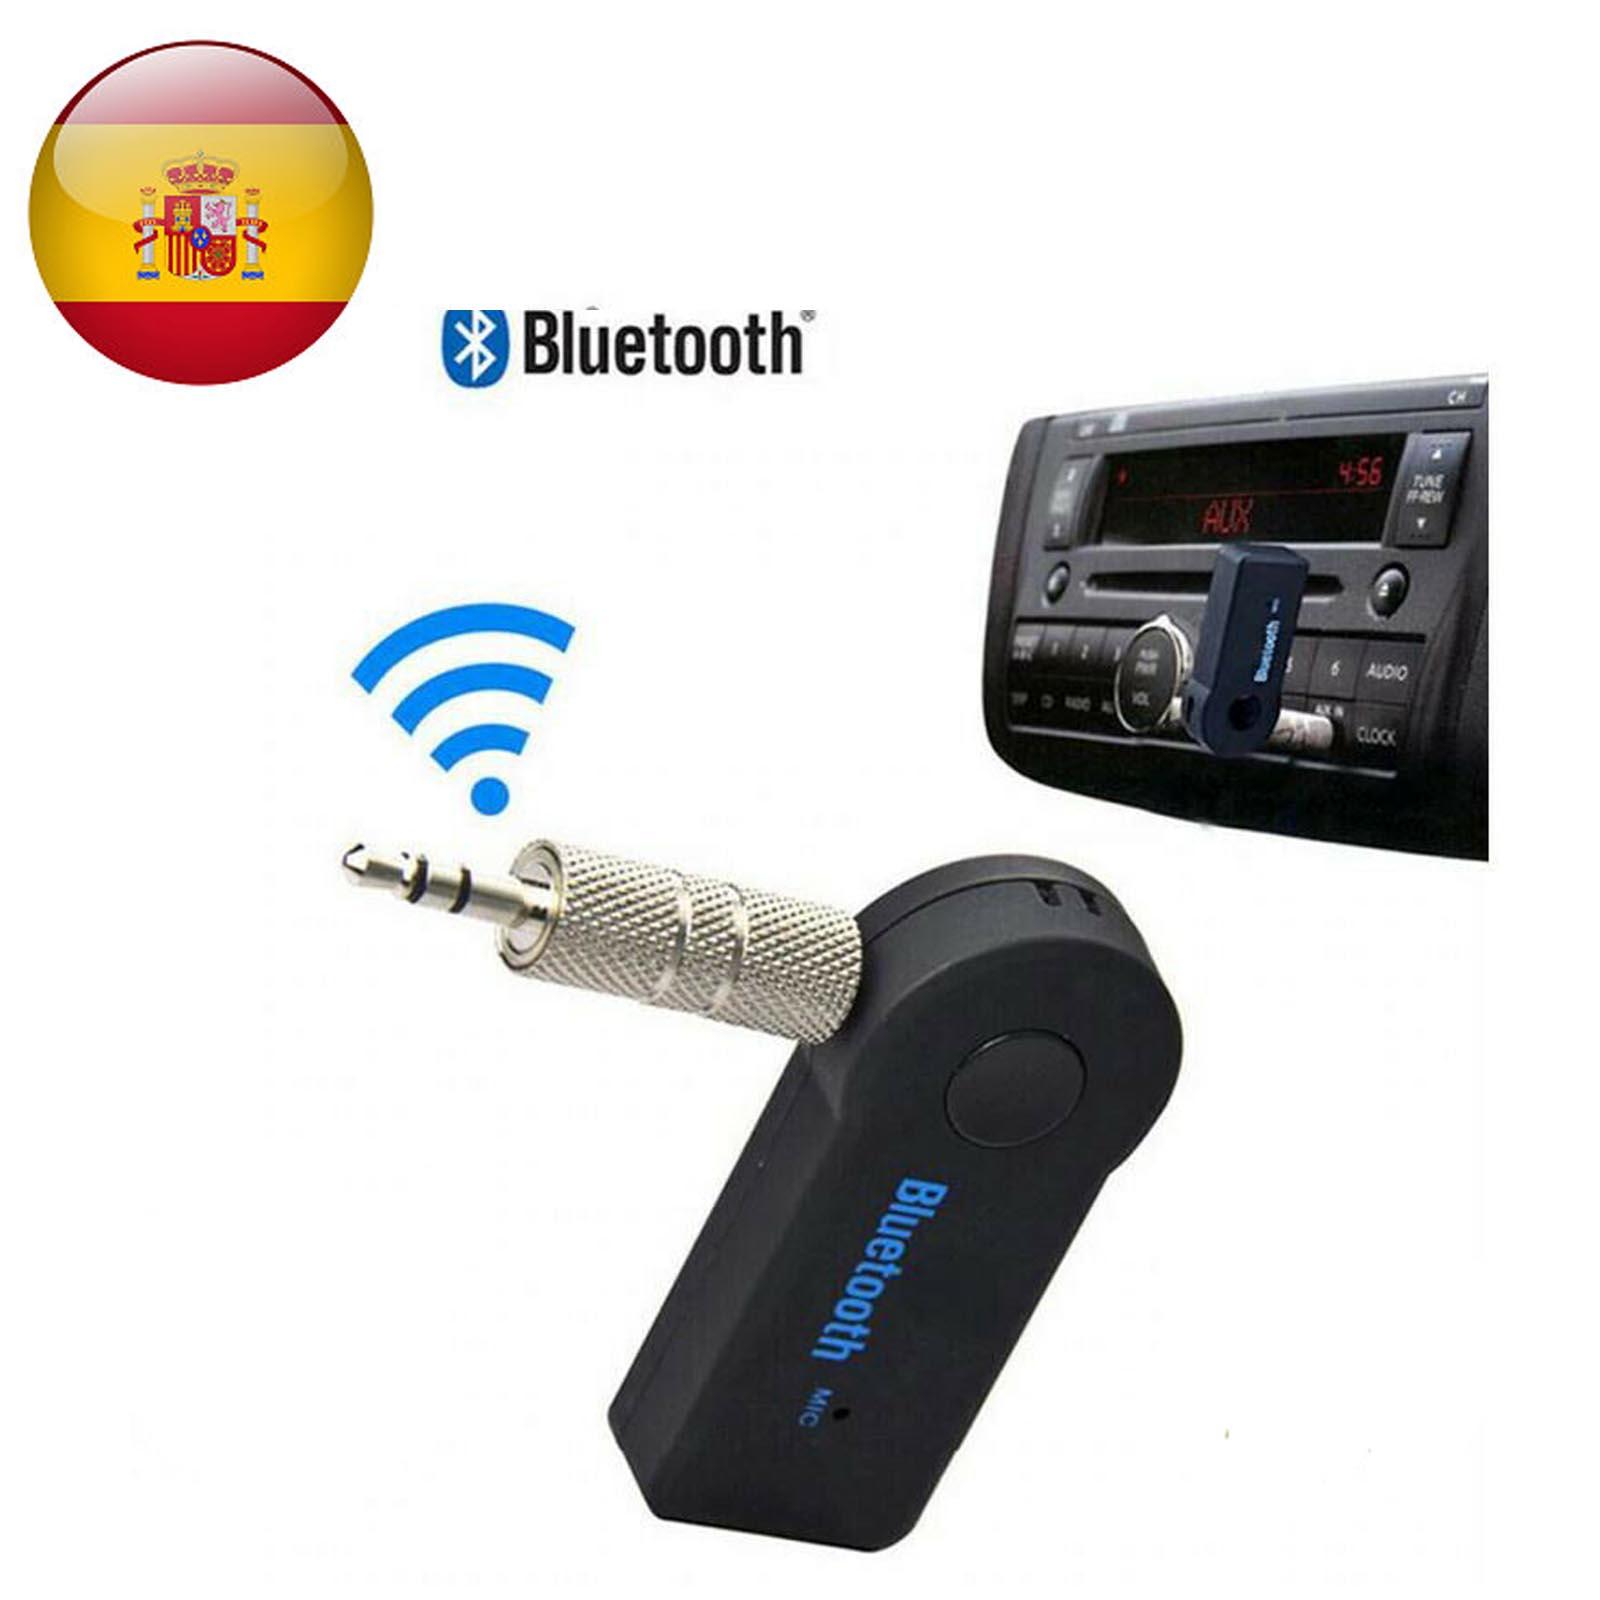 Récepteur Audio Inalámbrico Bluetooth BT 3.0 conecteur Aux Mini Jack 3.5mm Manos Libres Coche Batería Integrada Negro